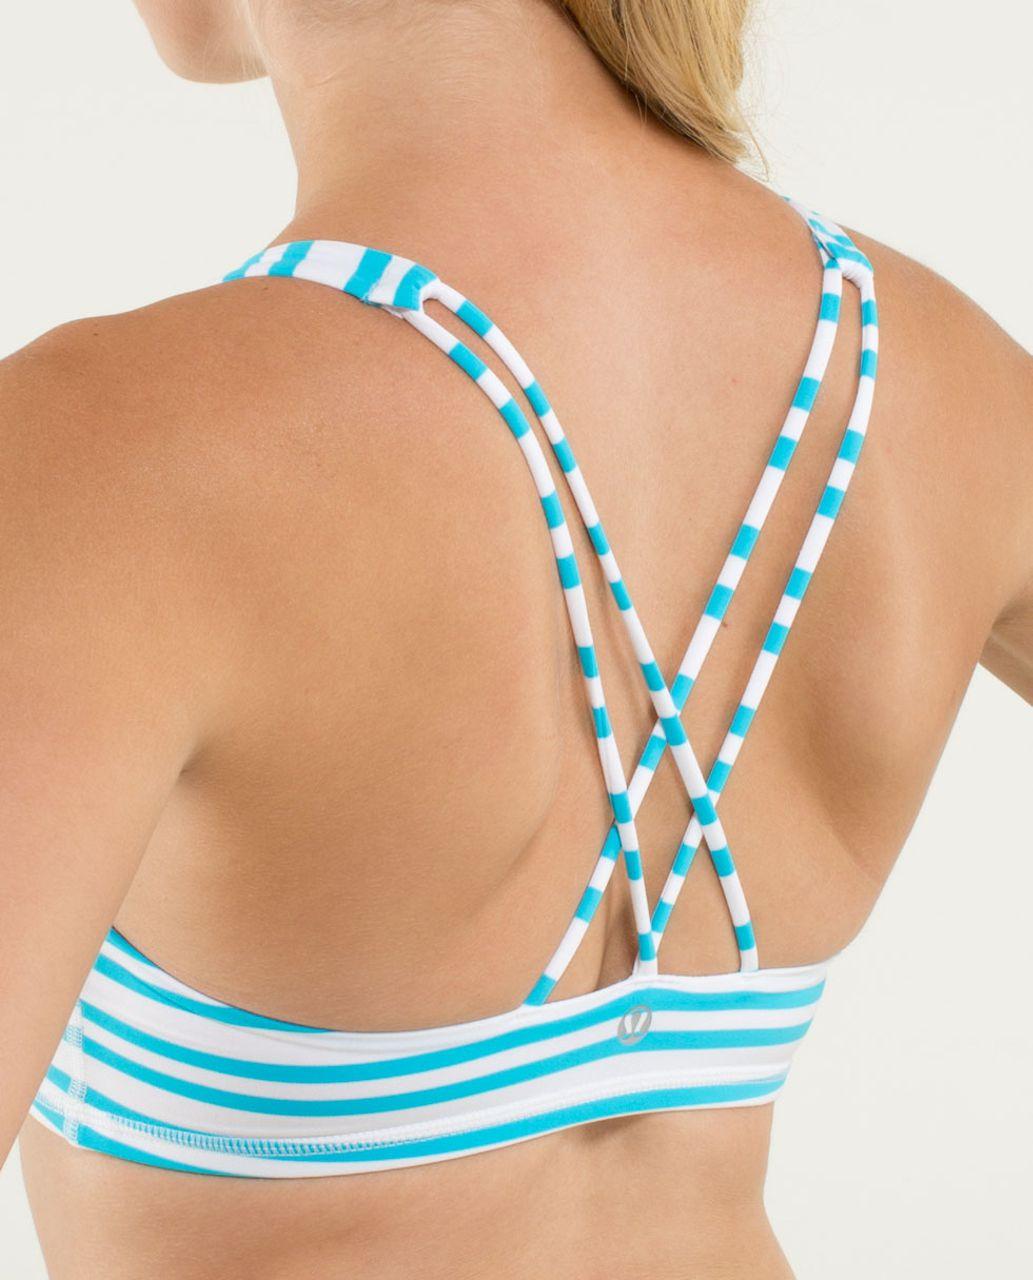 Lululemon Free To Be Bra - Twin Stripe Spry Blue